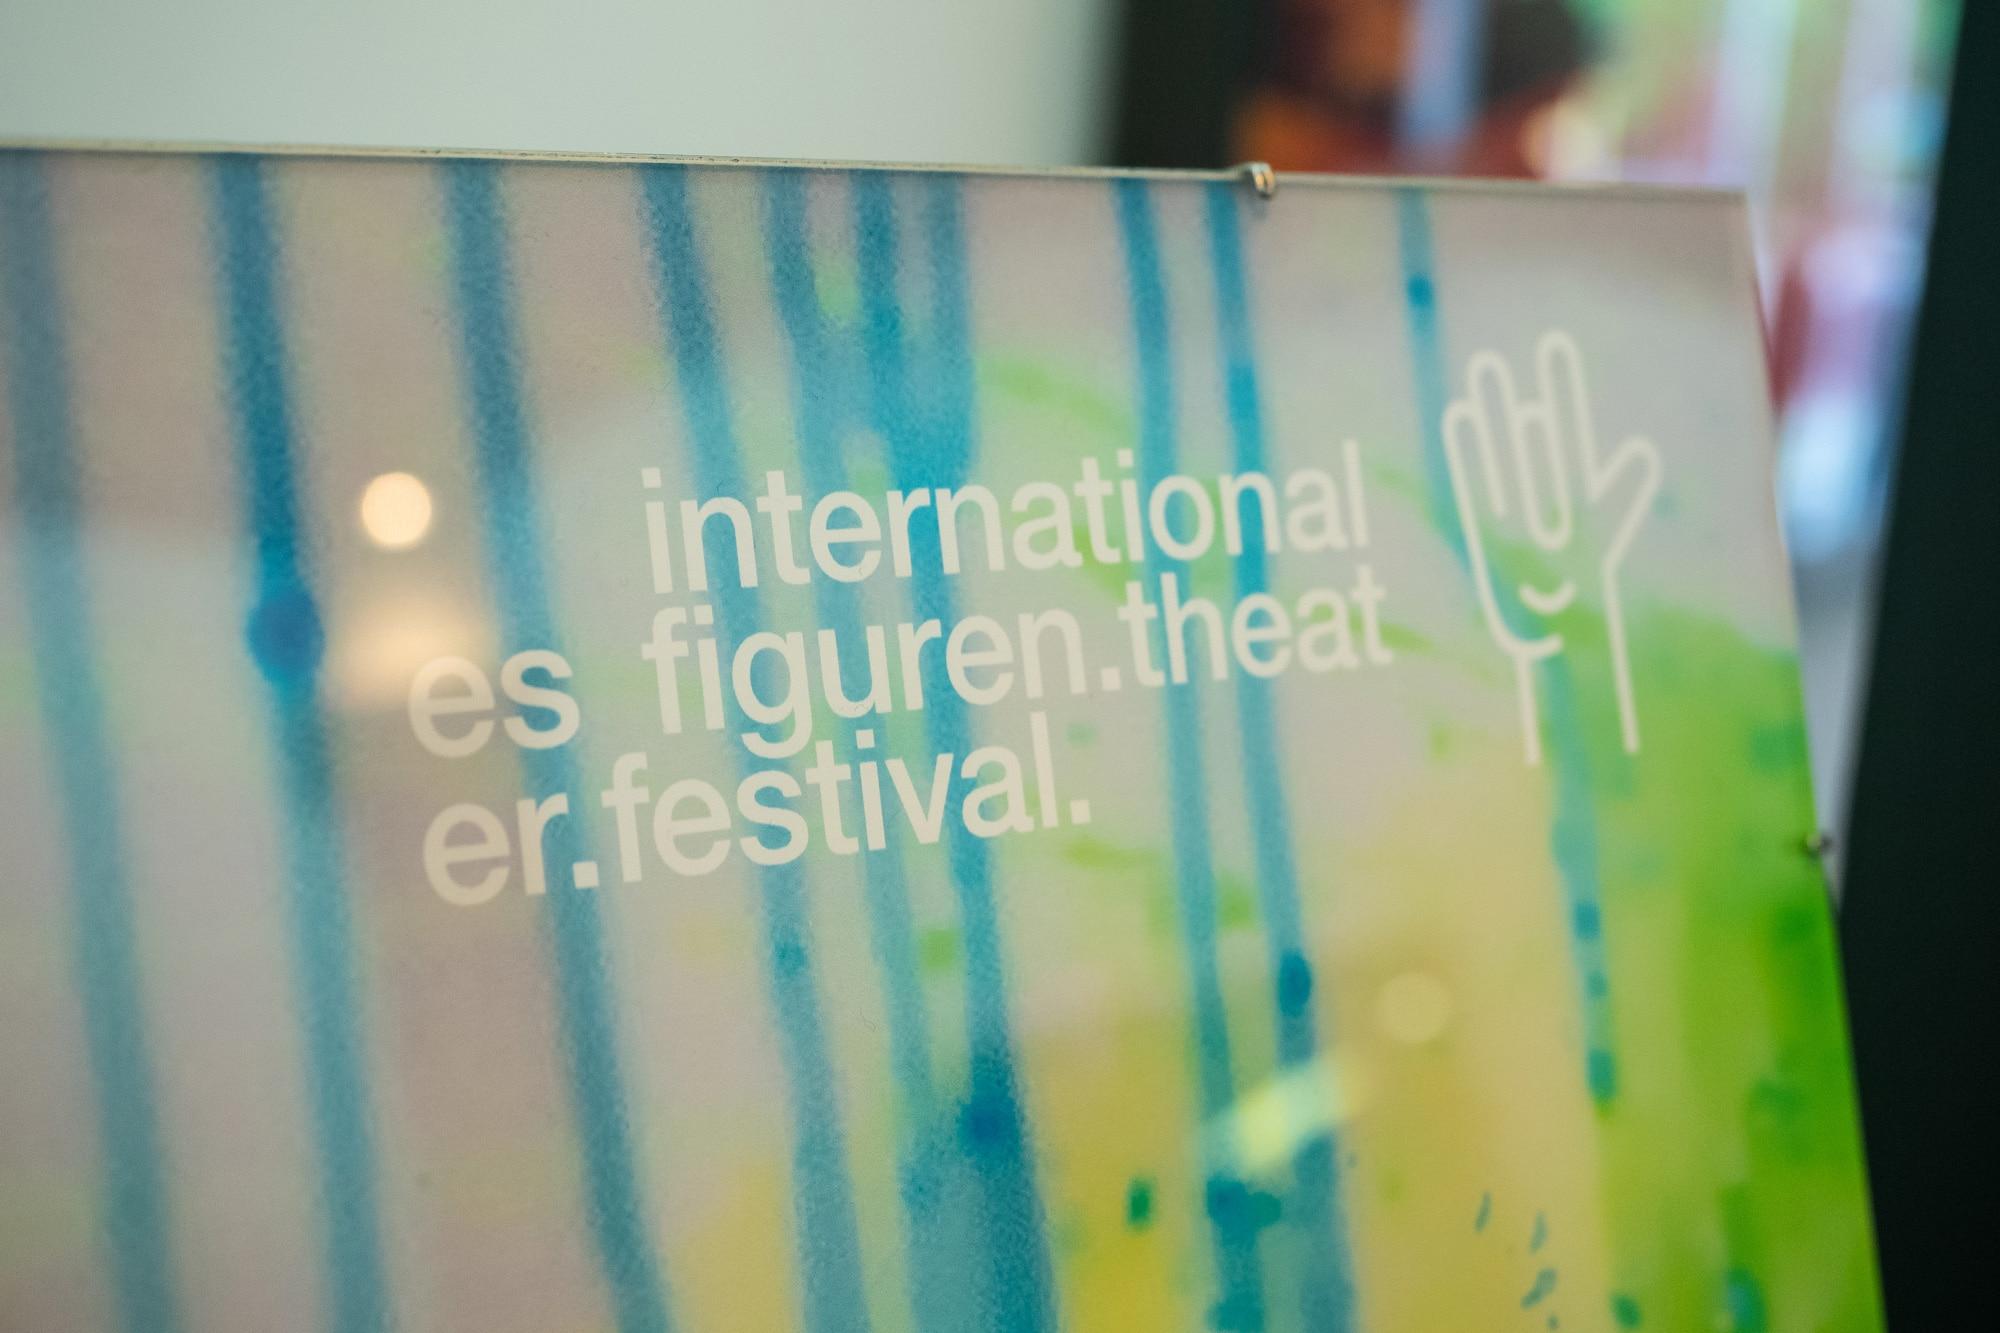 planx-internationales.figuren.theater.festival-Logo